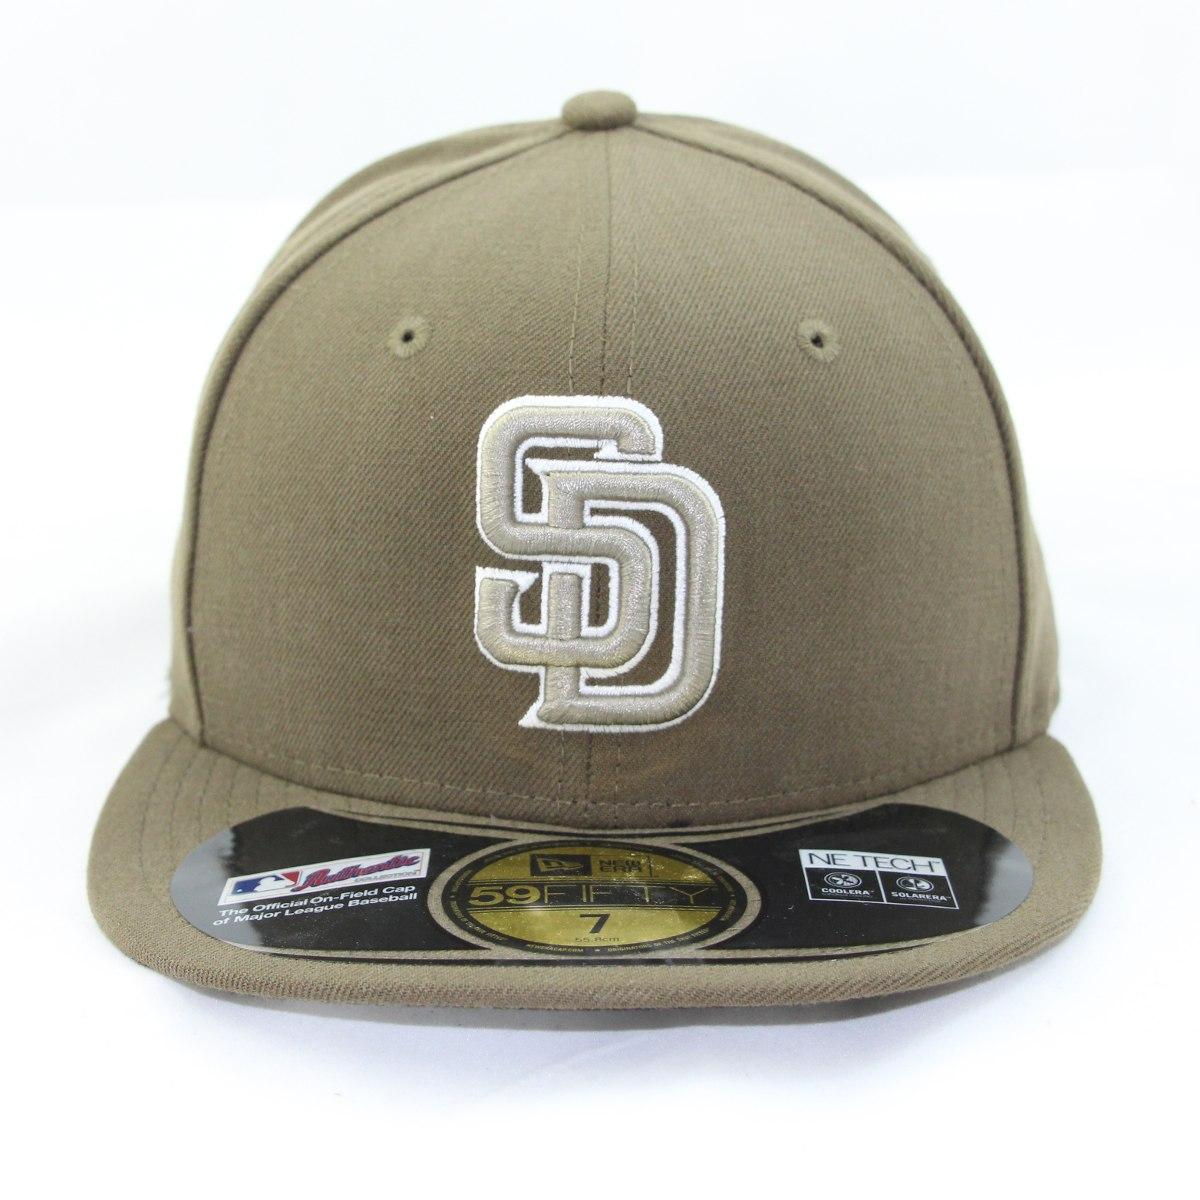 155b5615aab2b Gorra BORREGOS TEC 5950. Gorras Originales New Era Beisbol San Diego Padres  59fifty